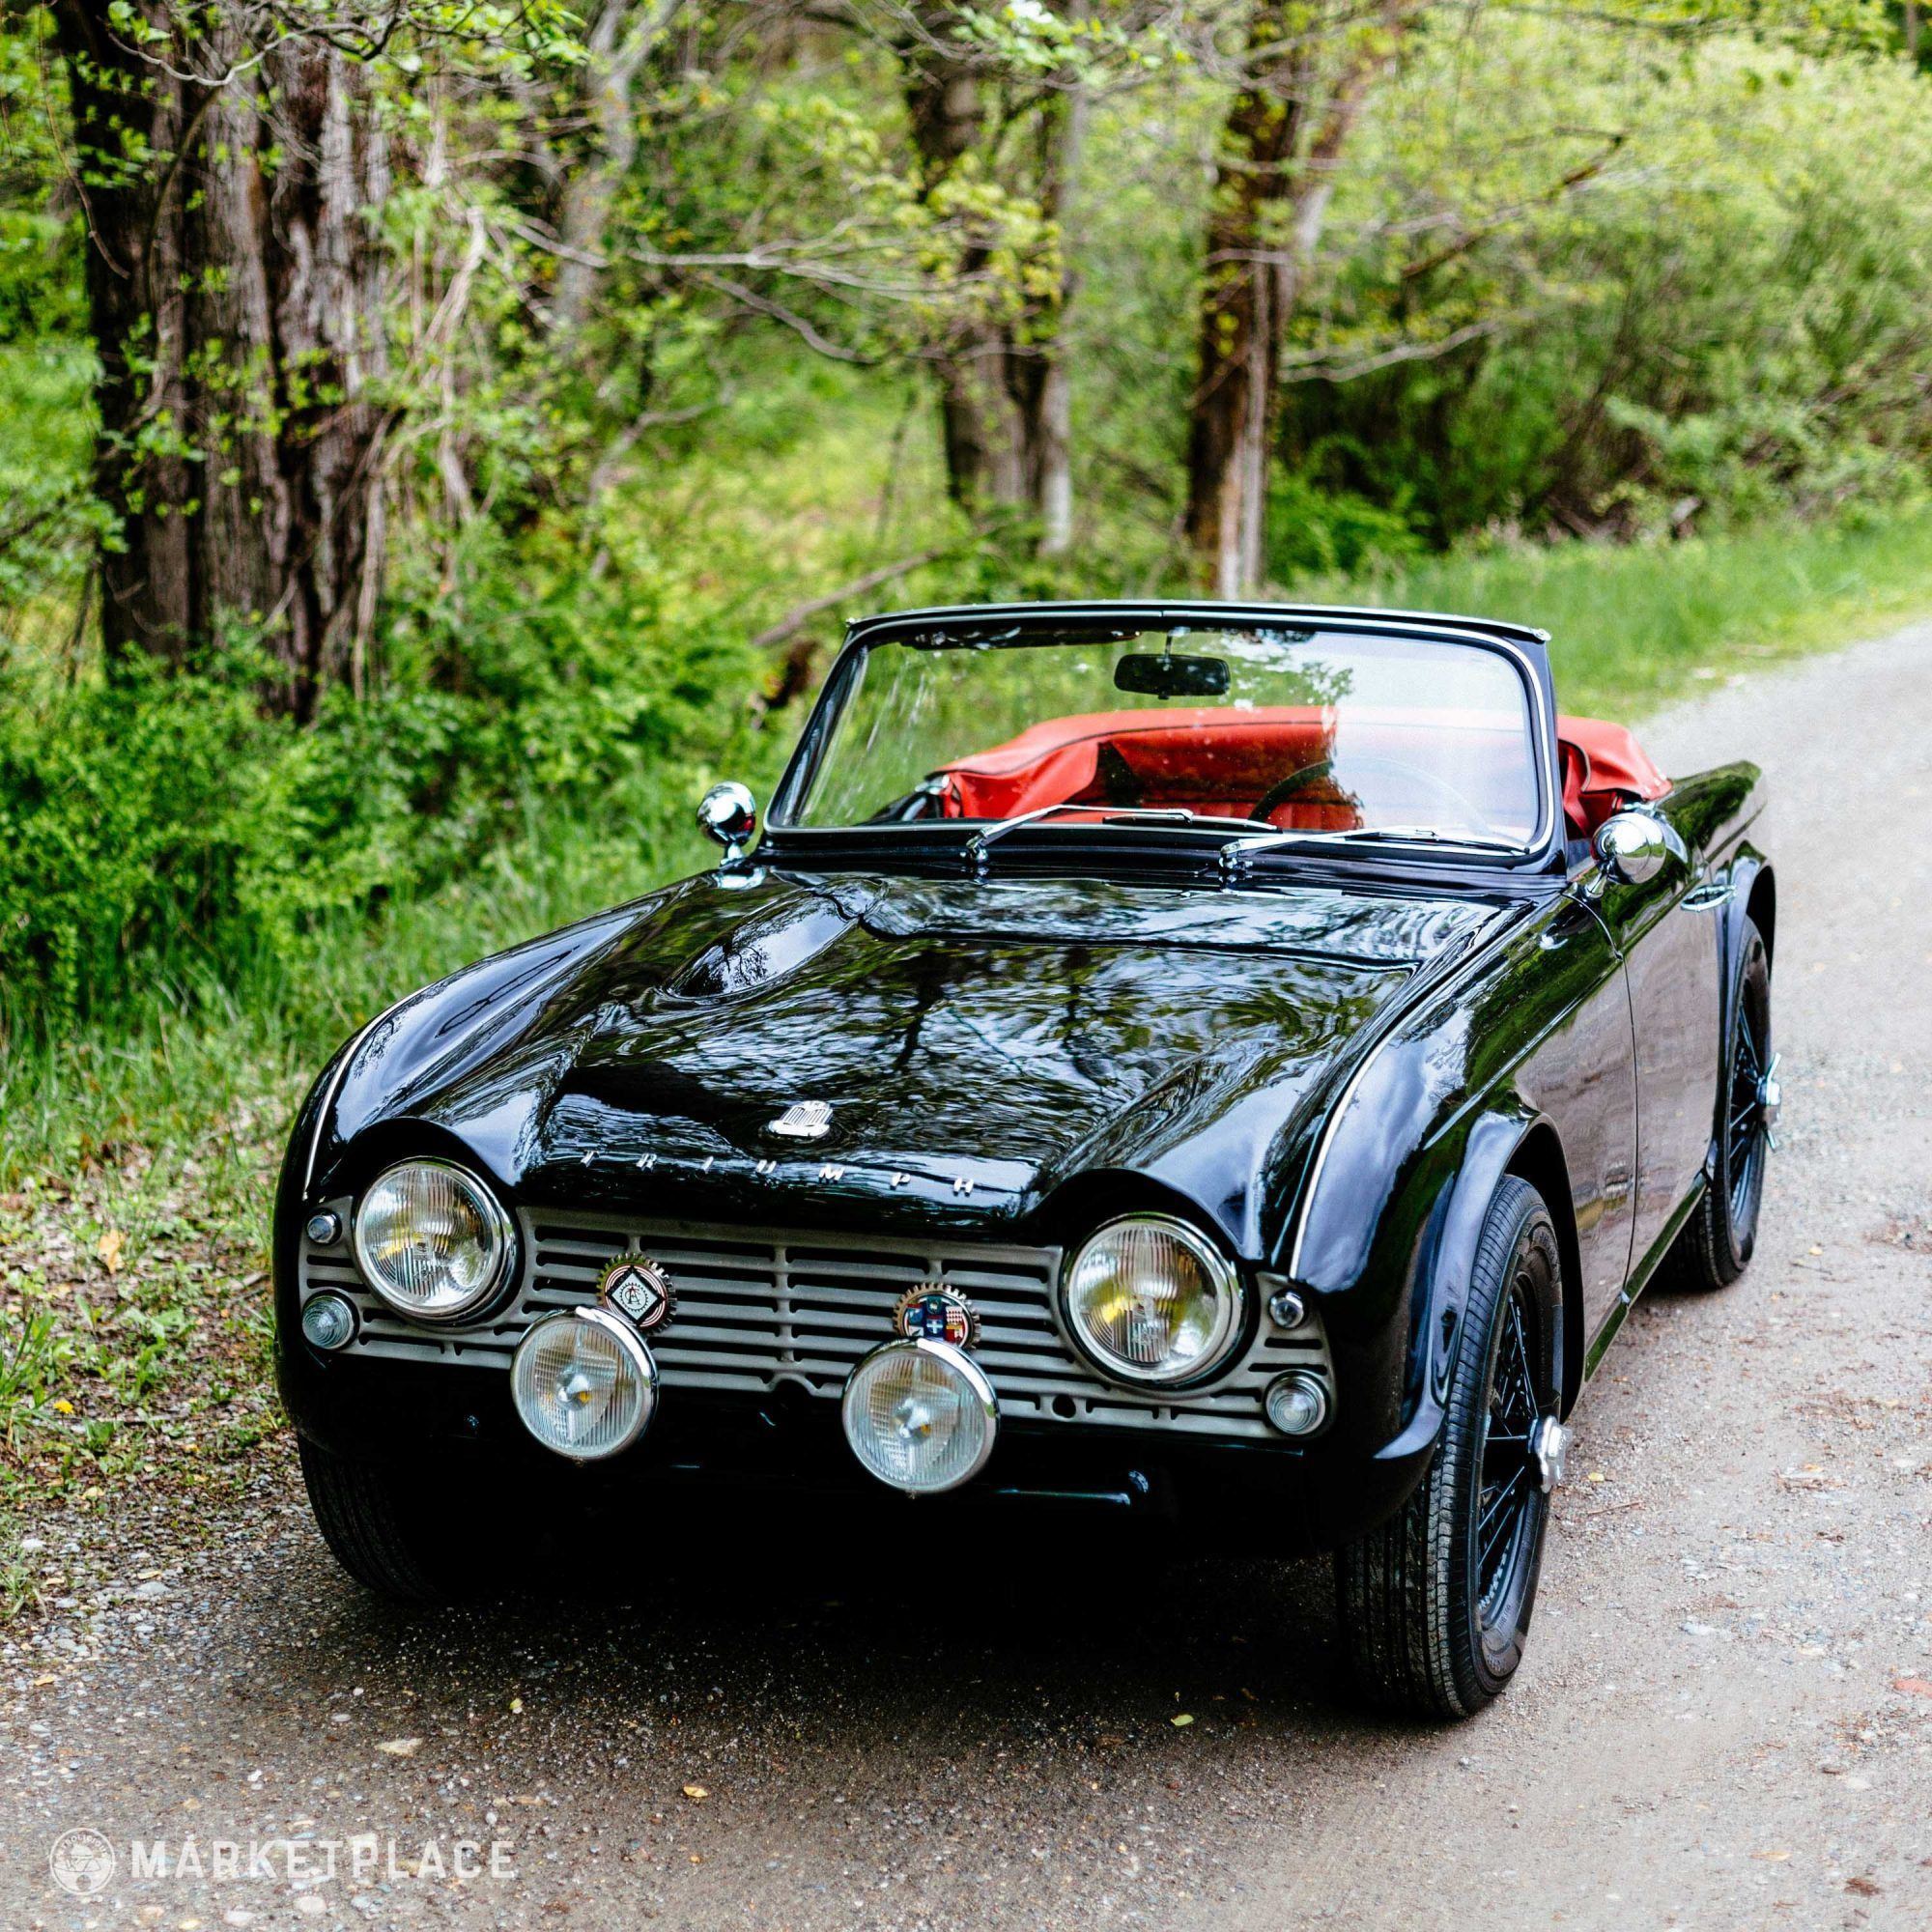 1961 Triumph TR4 w/ Engine Audio Clips Classic car show